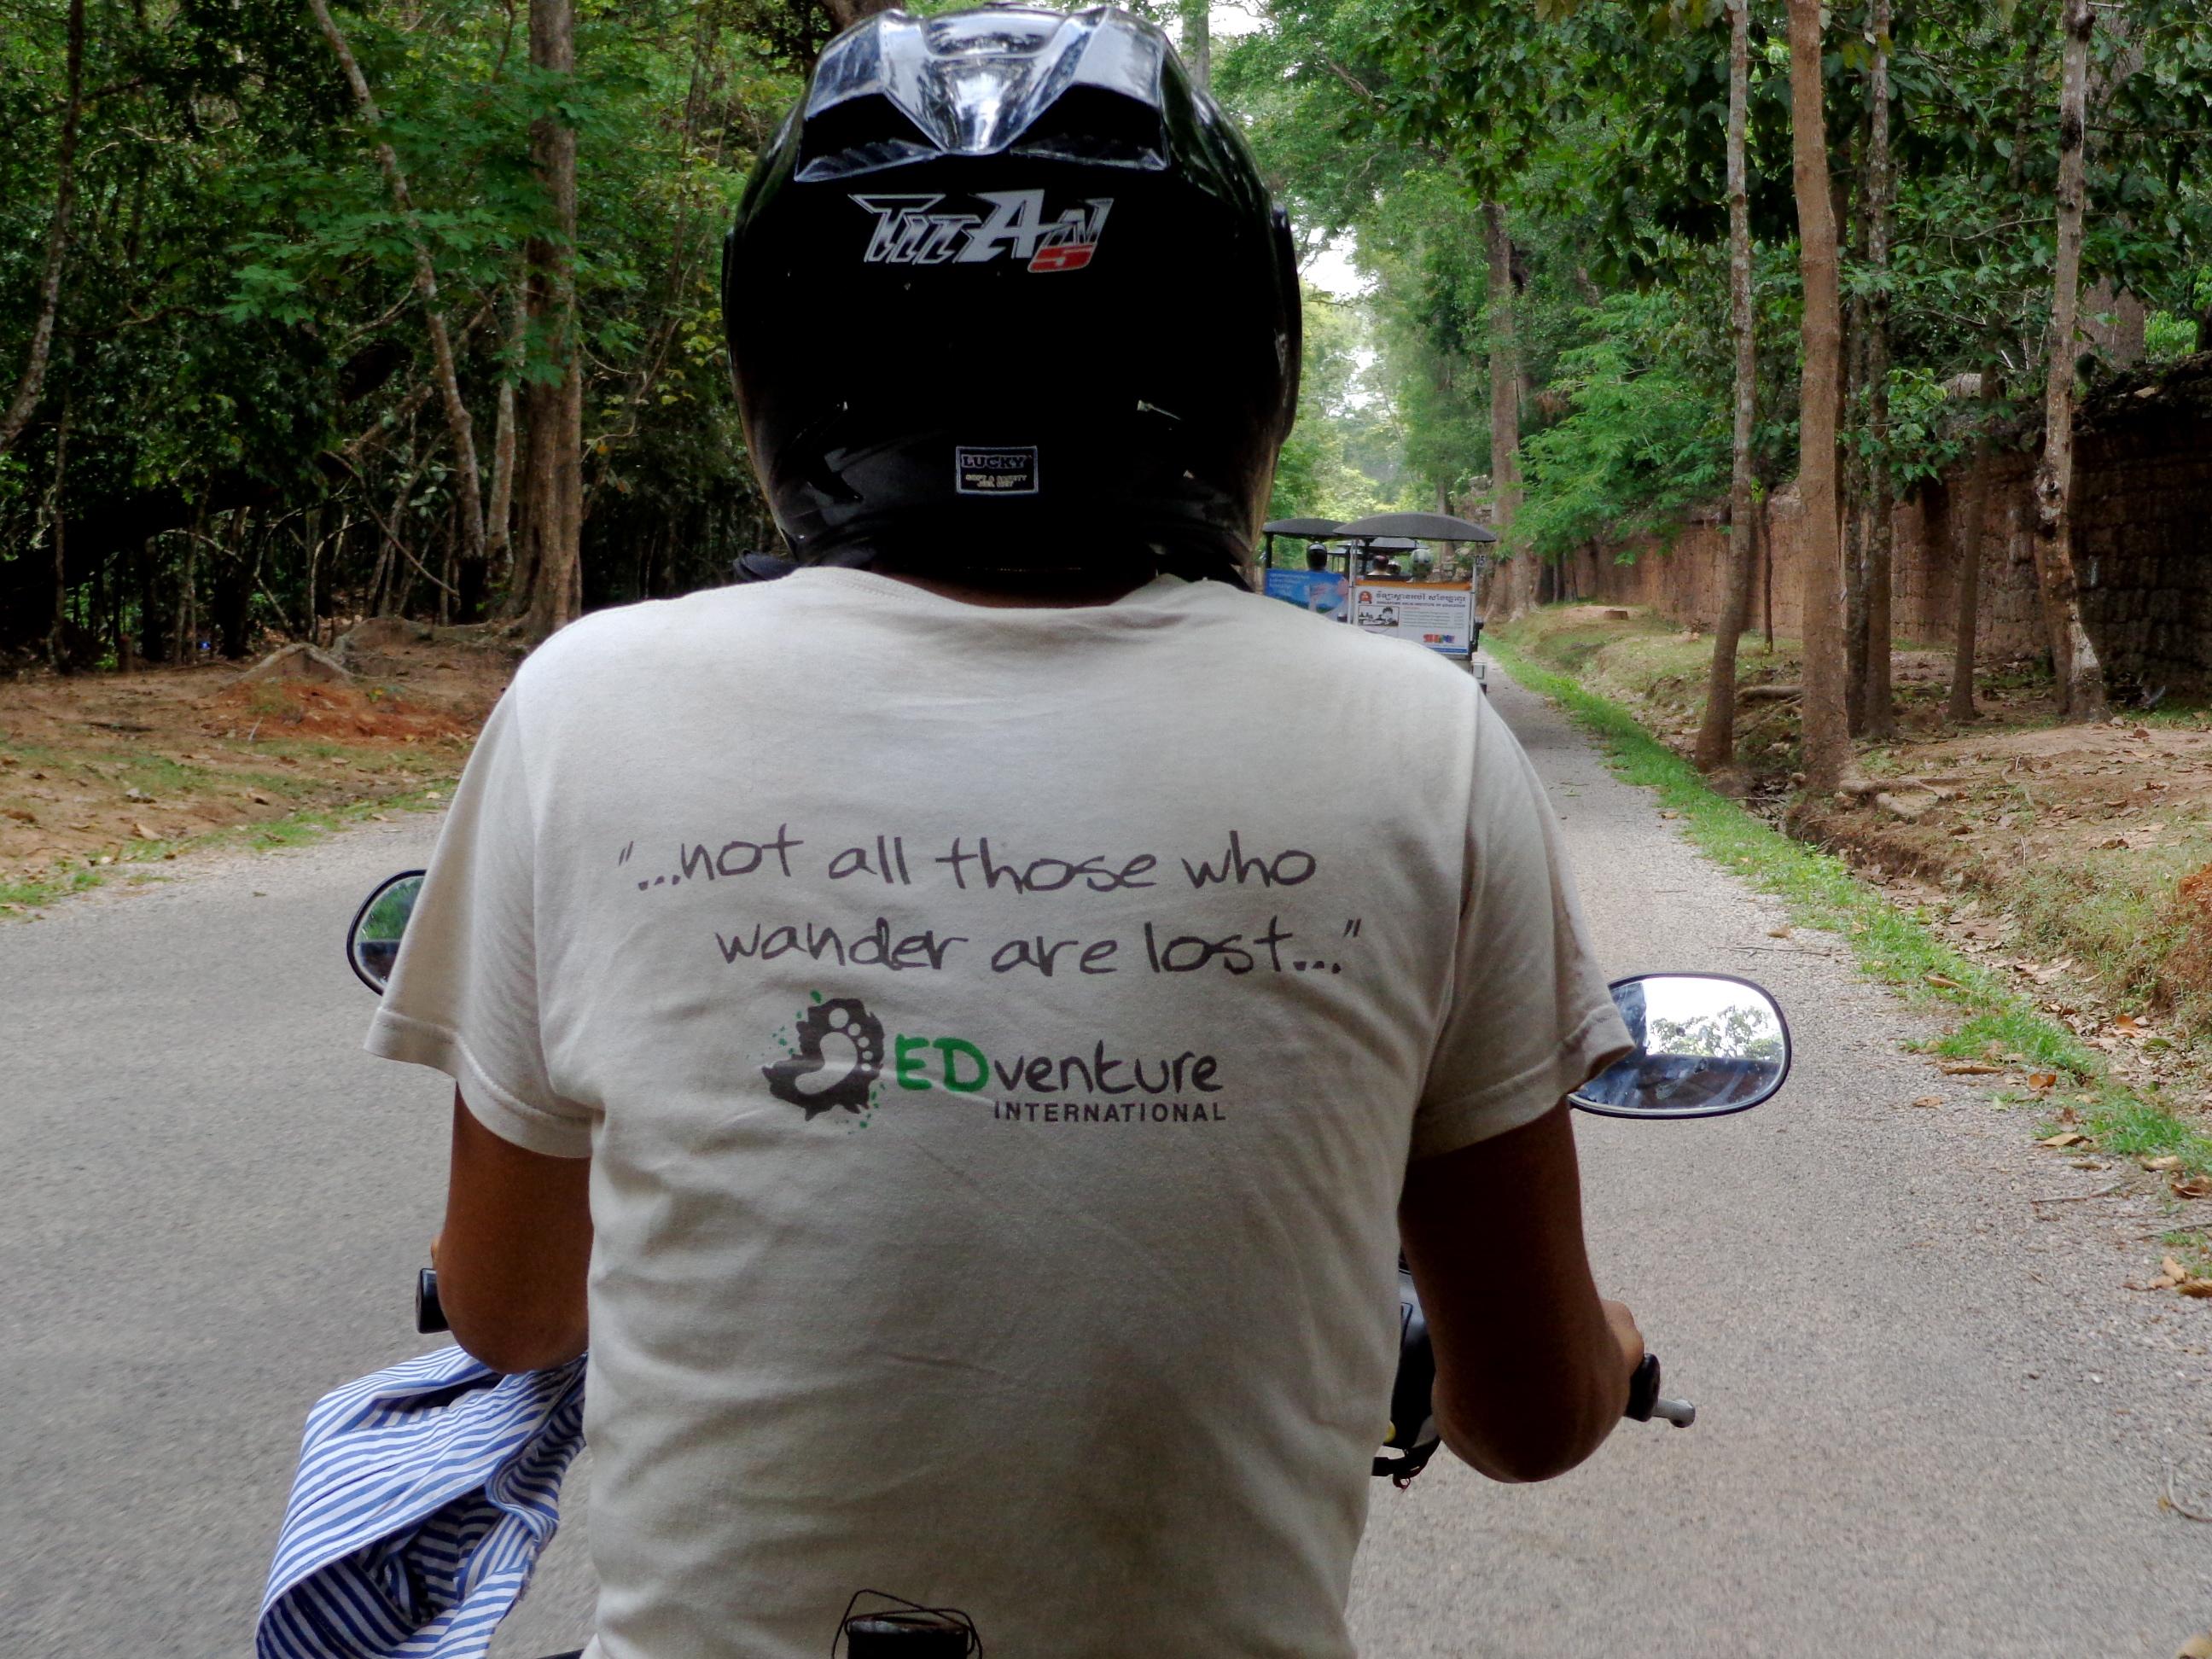 Riding in a tuk tuk through angkor wat